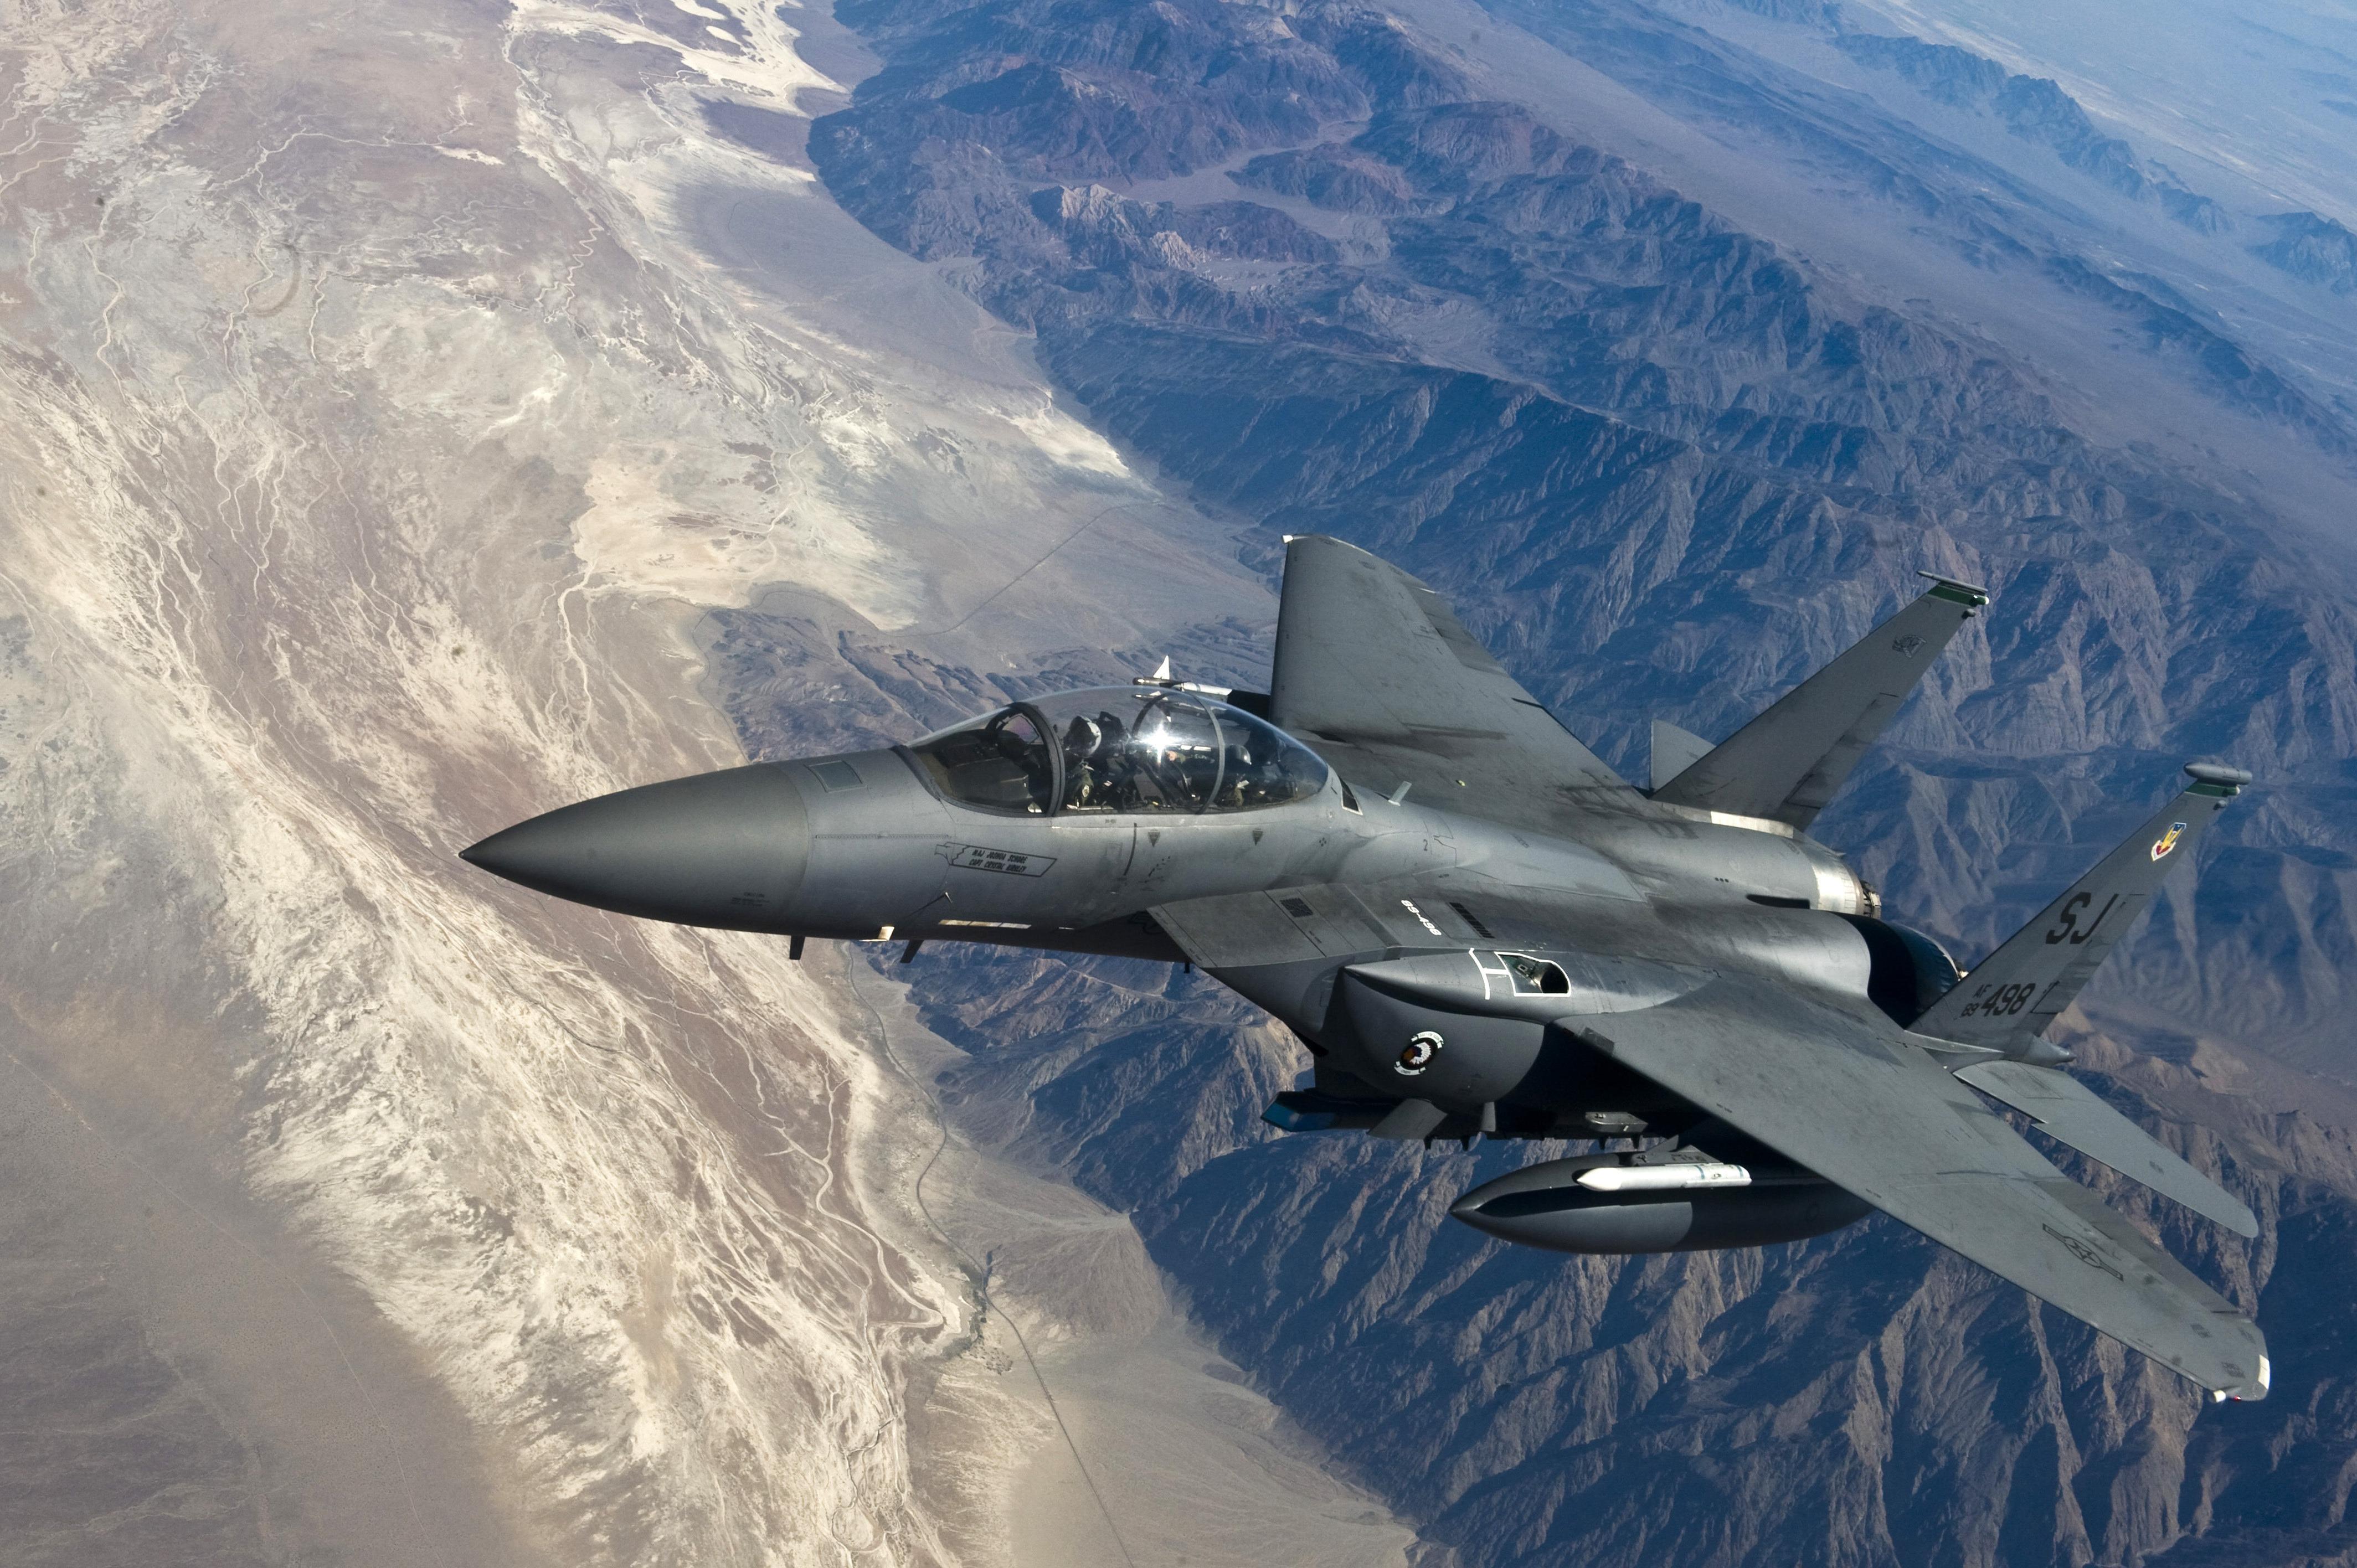 A modern fighter jet flying over mountainous terrain.